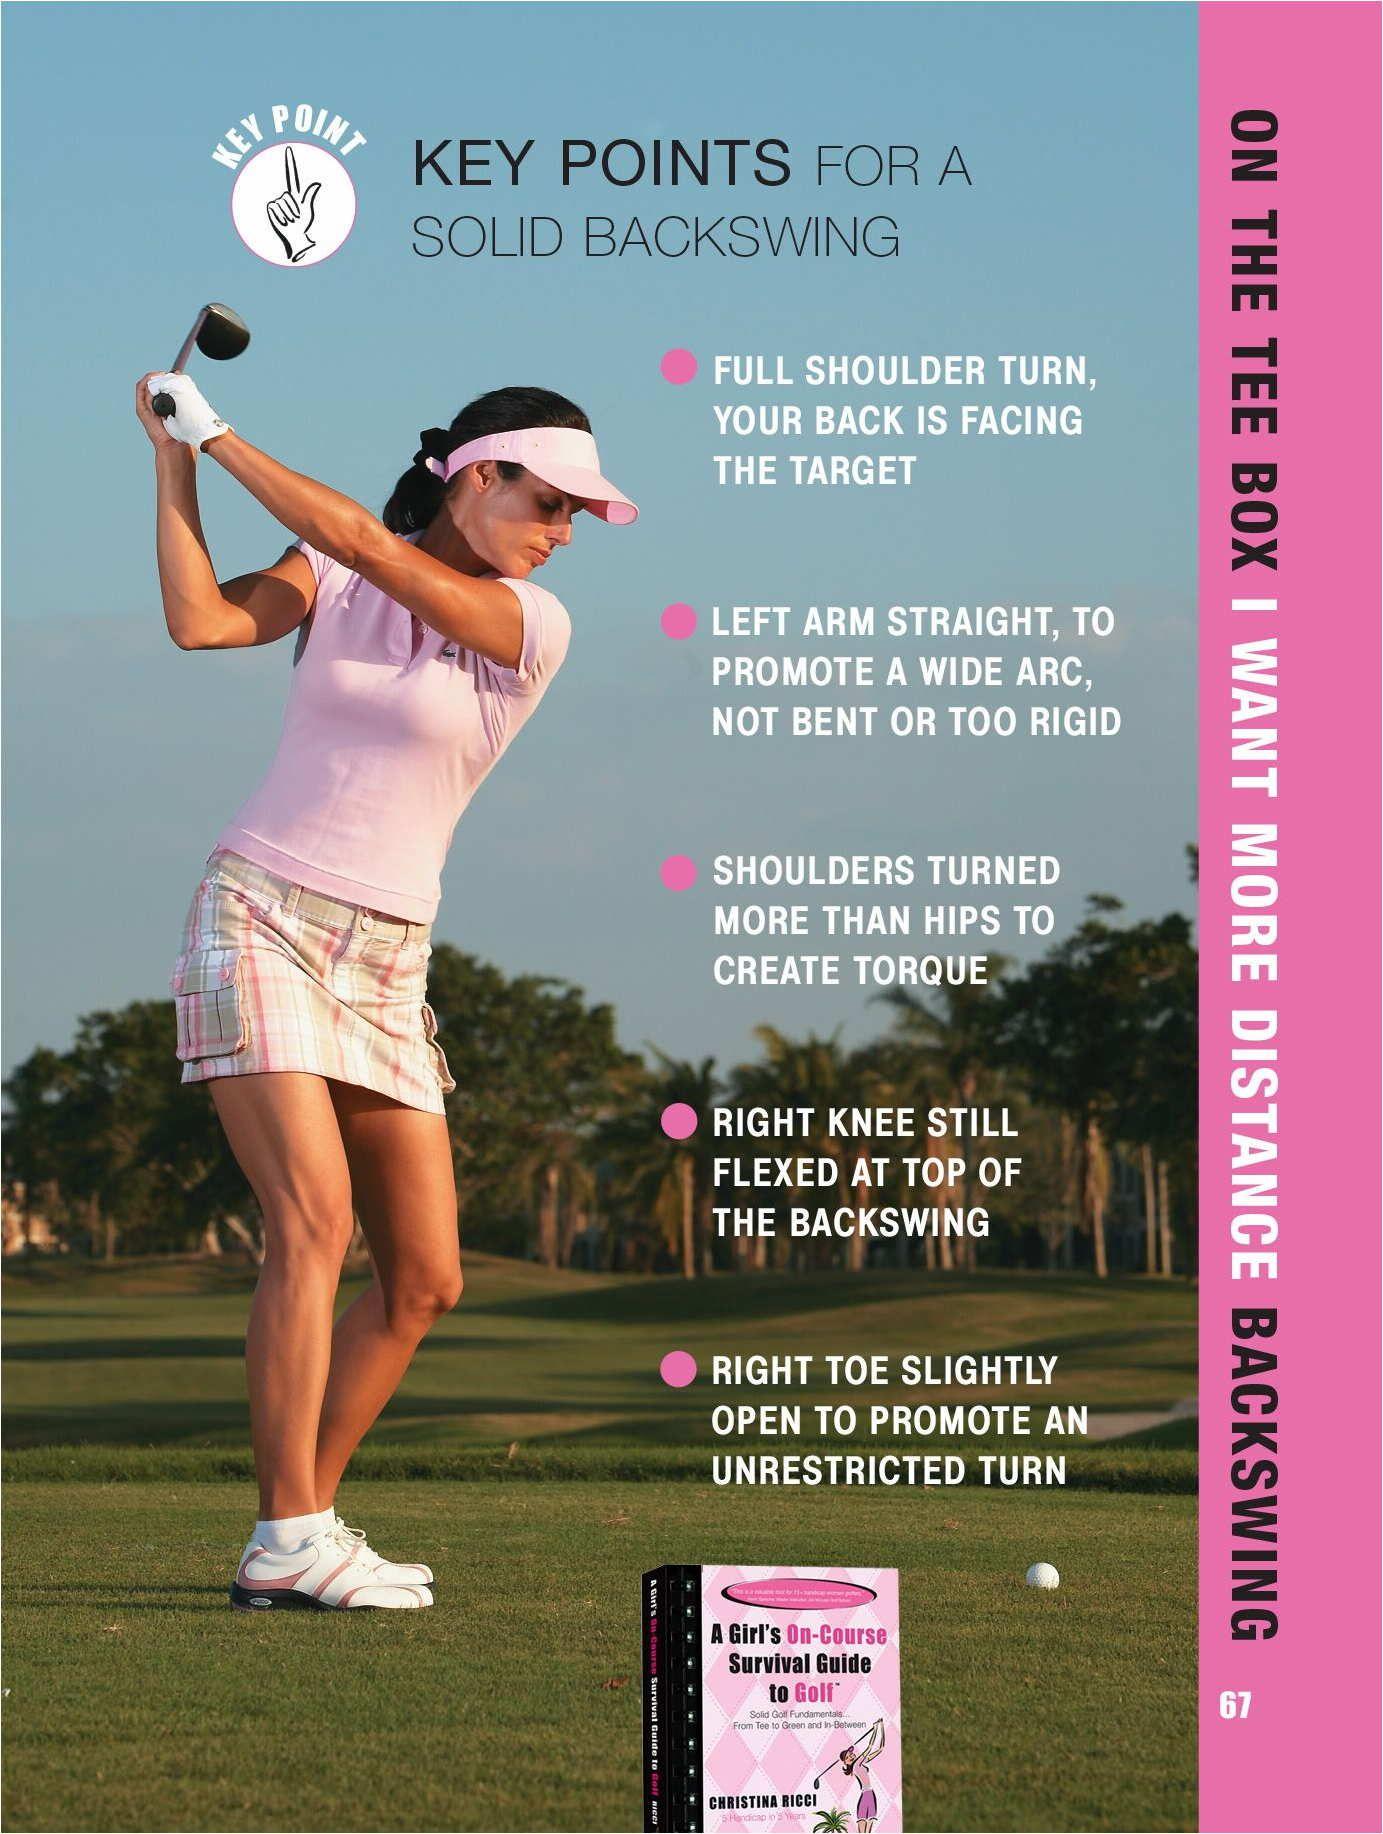 Winning Tips To Improve Your Golf Skills All About Golf Tips Golf Tips For Beginners Golf Outfit Golf Fashion